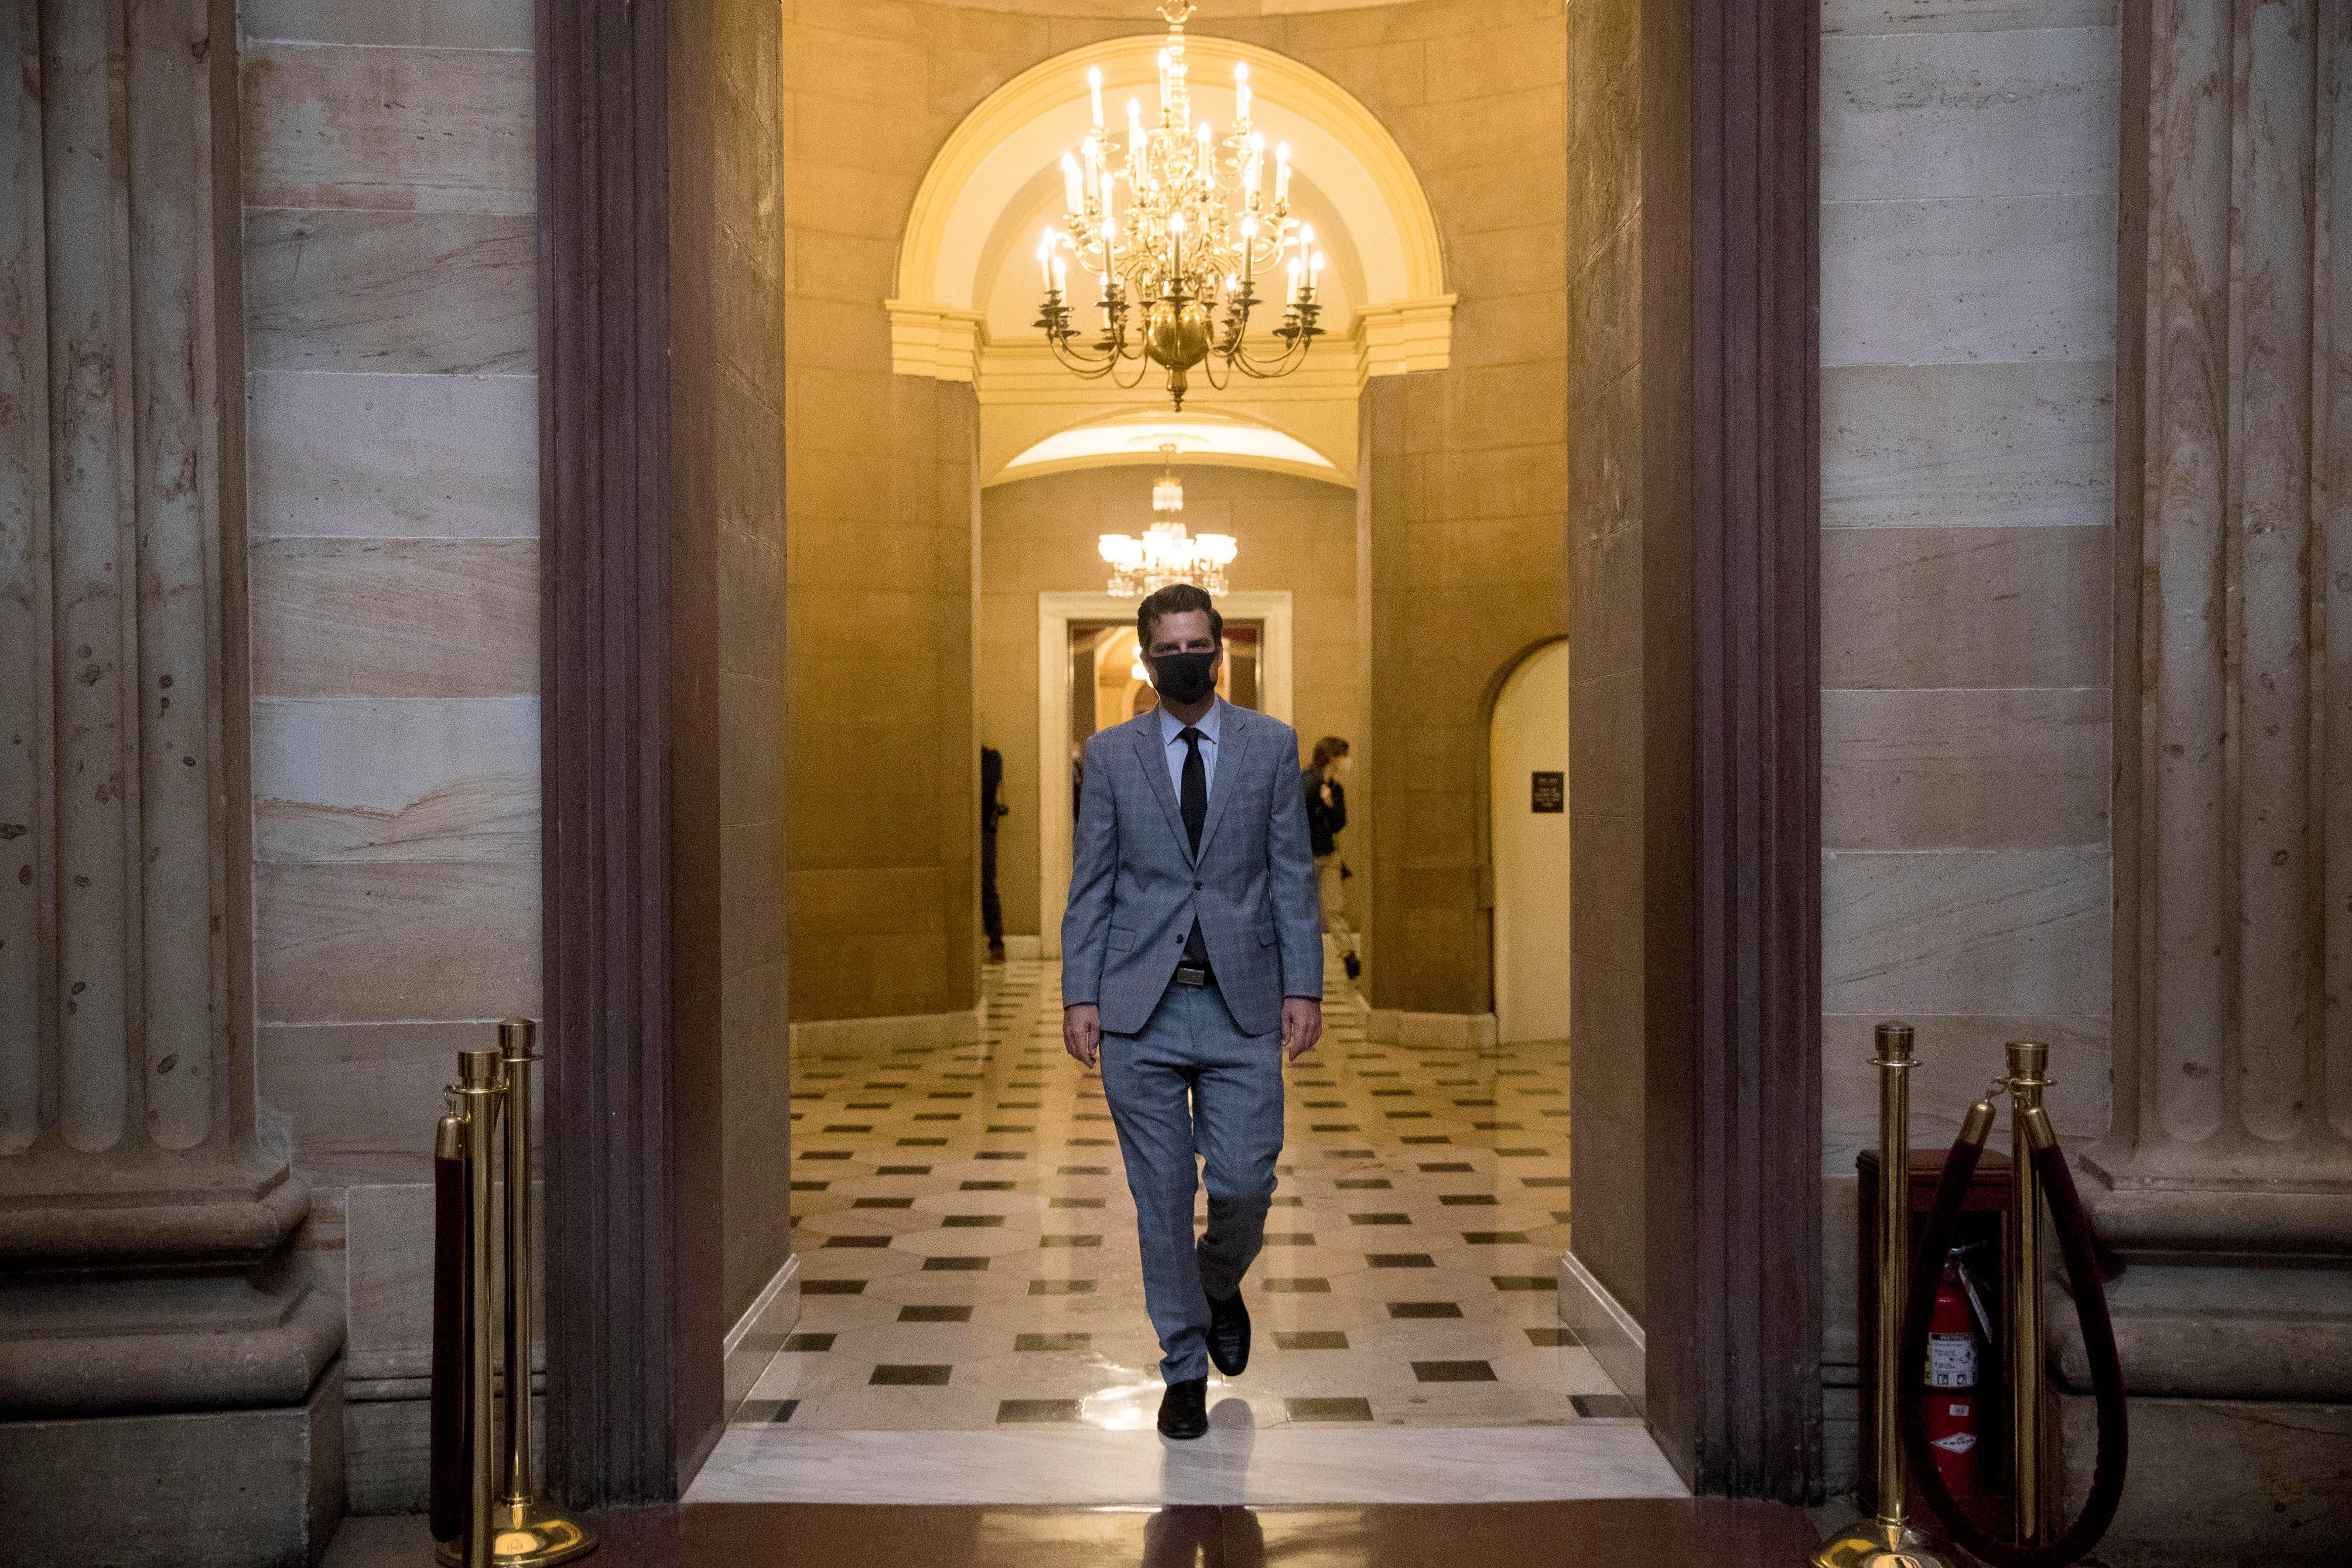 Exclusive: Ex-Speaker Boehner says Matt Gaetz should resign if indicted – or be expelled